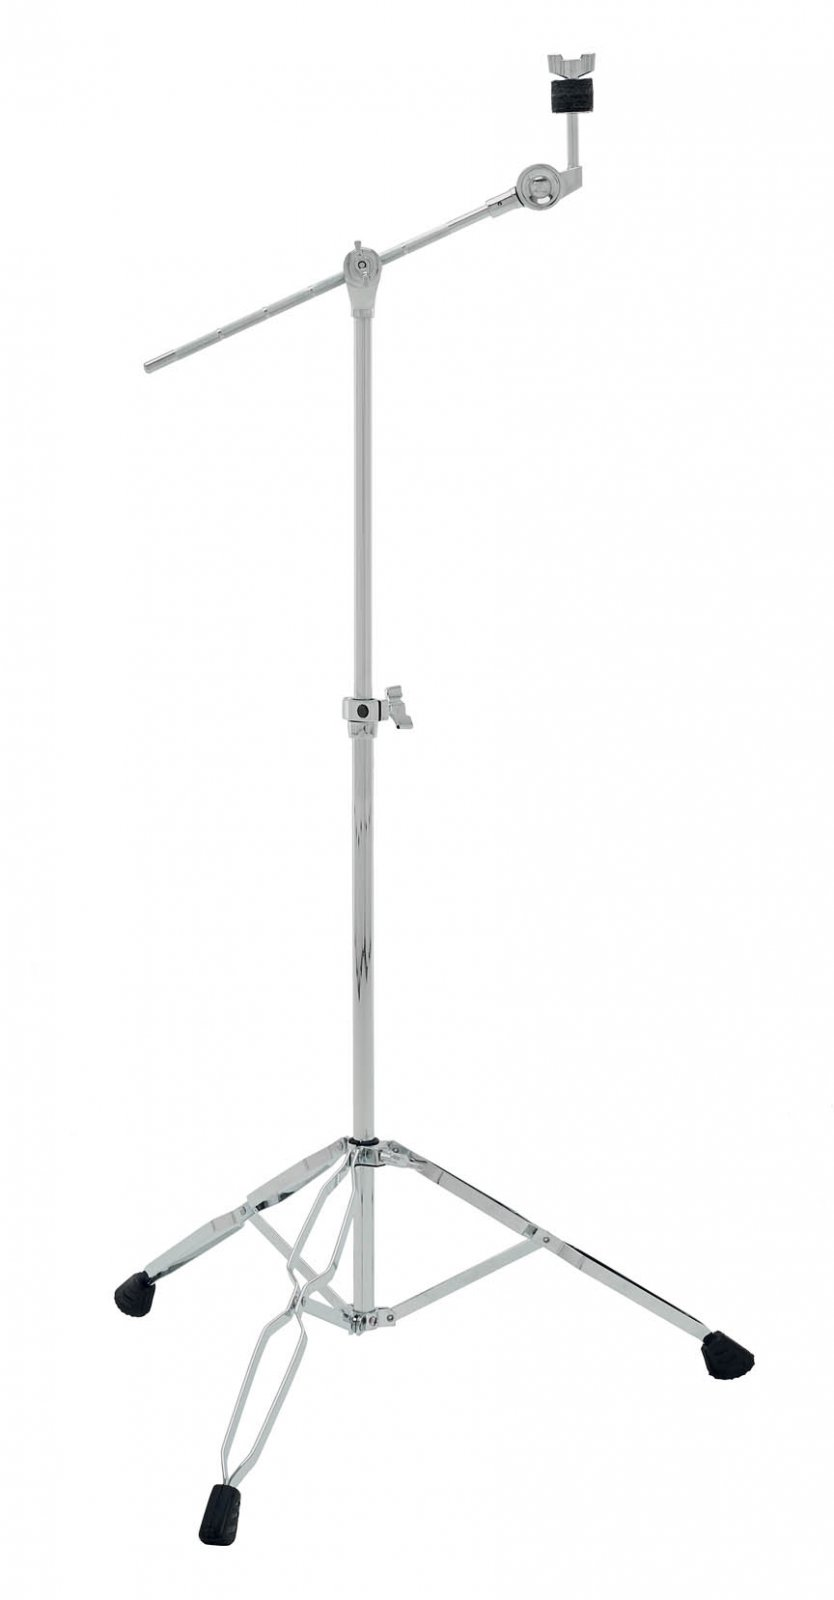 GIBRALTAR 4709 LIGHT WEIGHT BOOM CYMBAL STAND